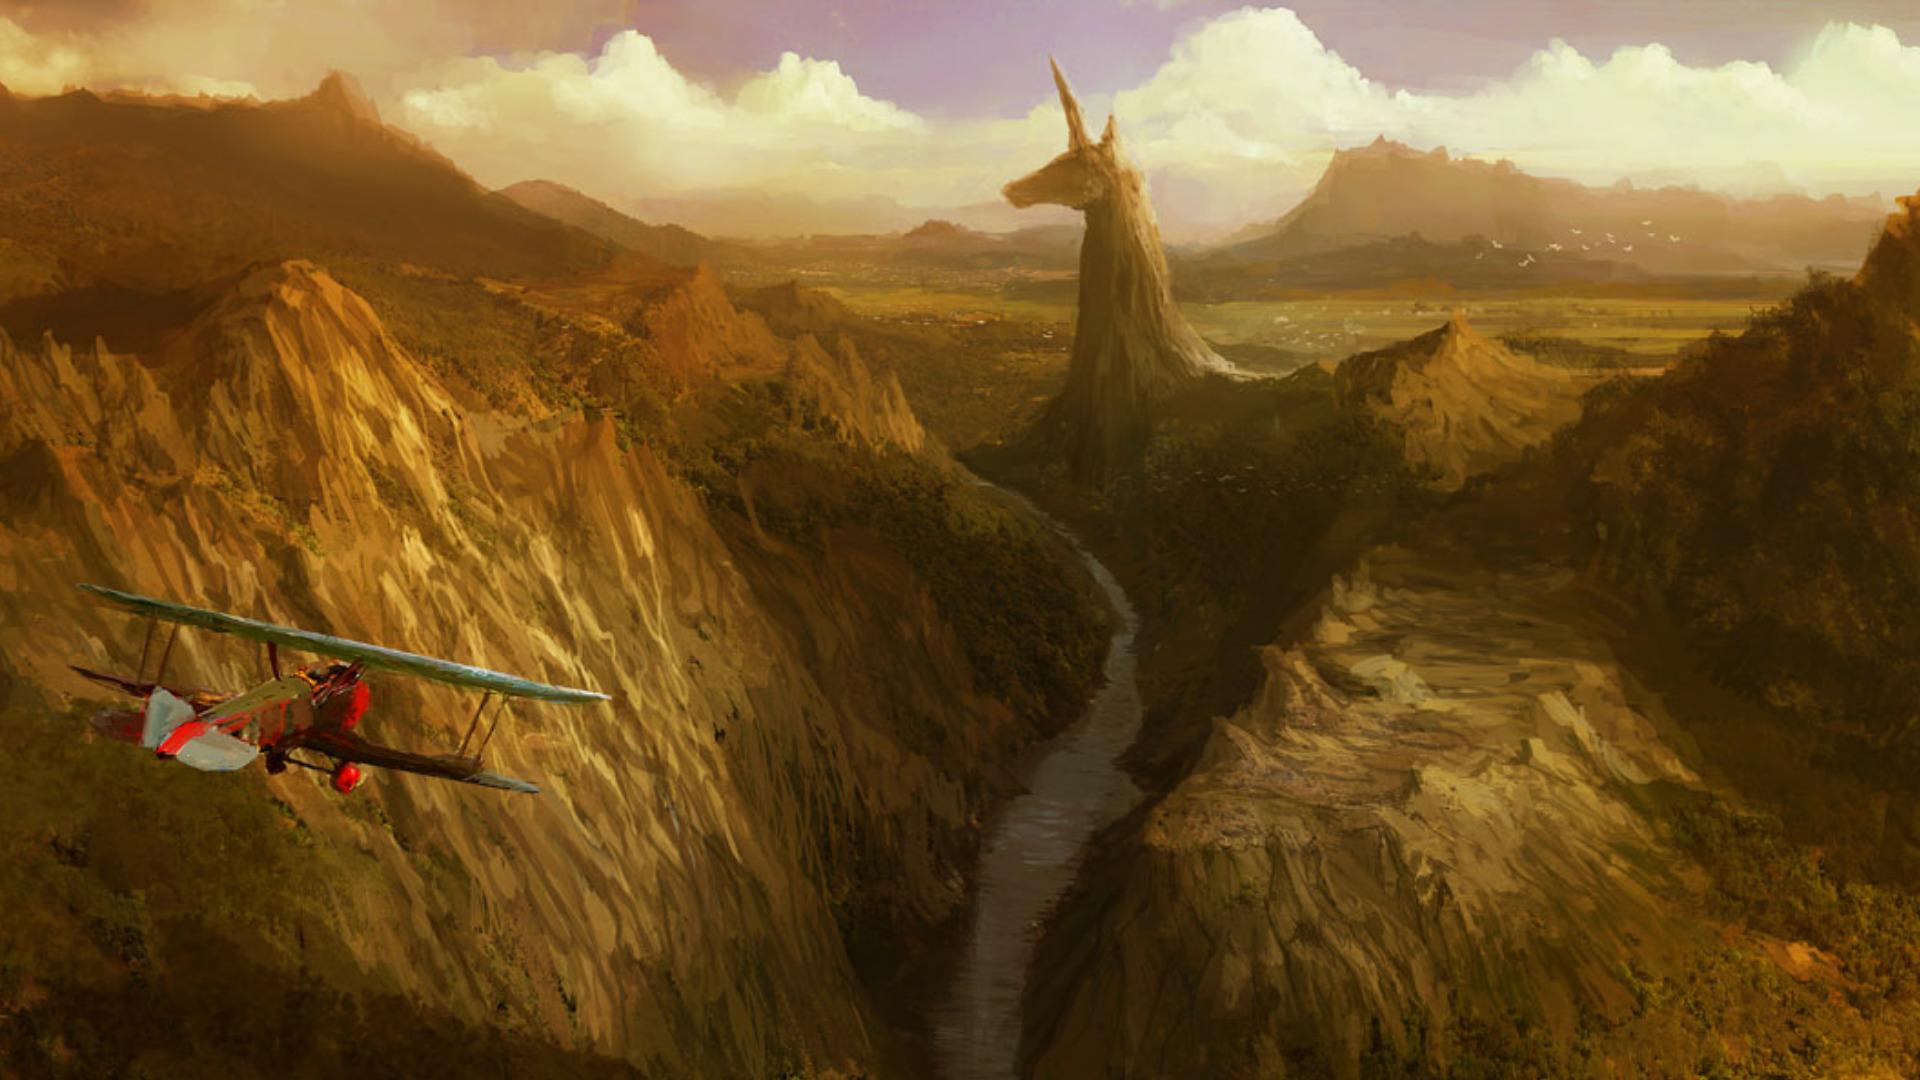 Adventure HD Wallpaper Background Image 1920x1080 ID270459 1920x1080